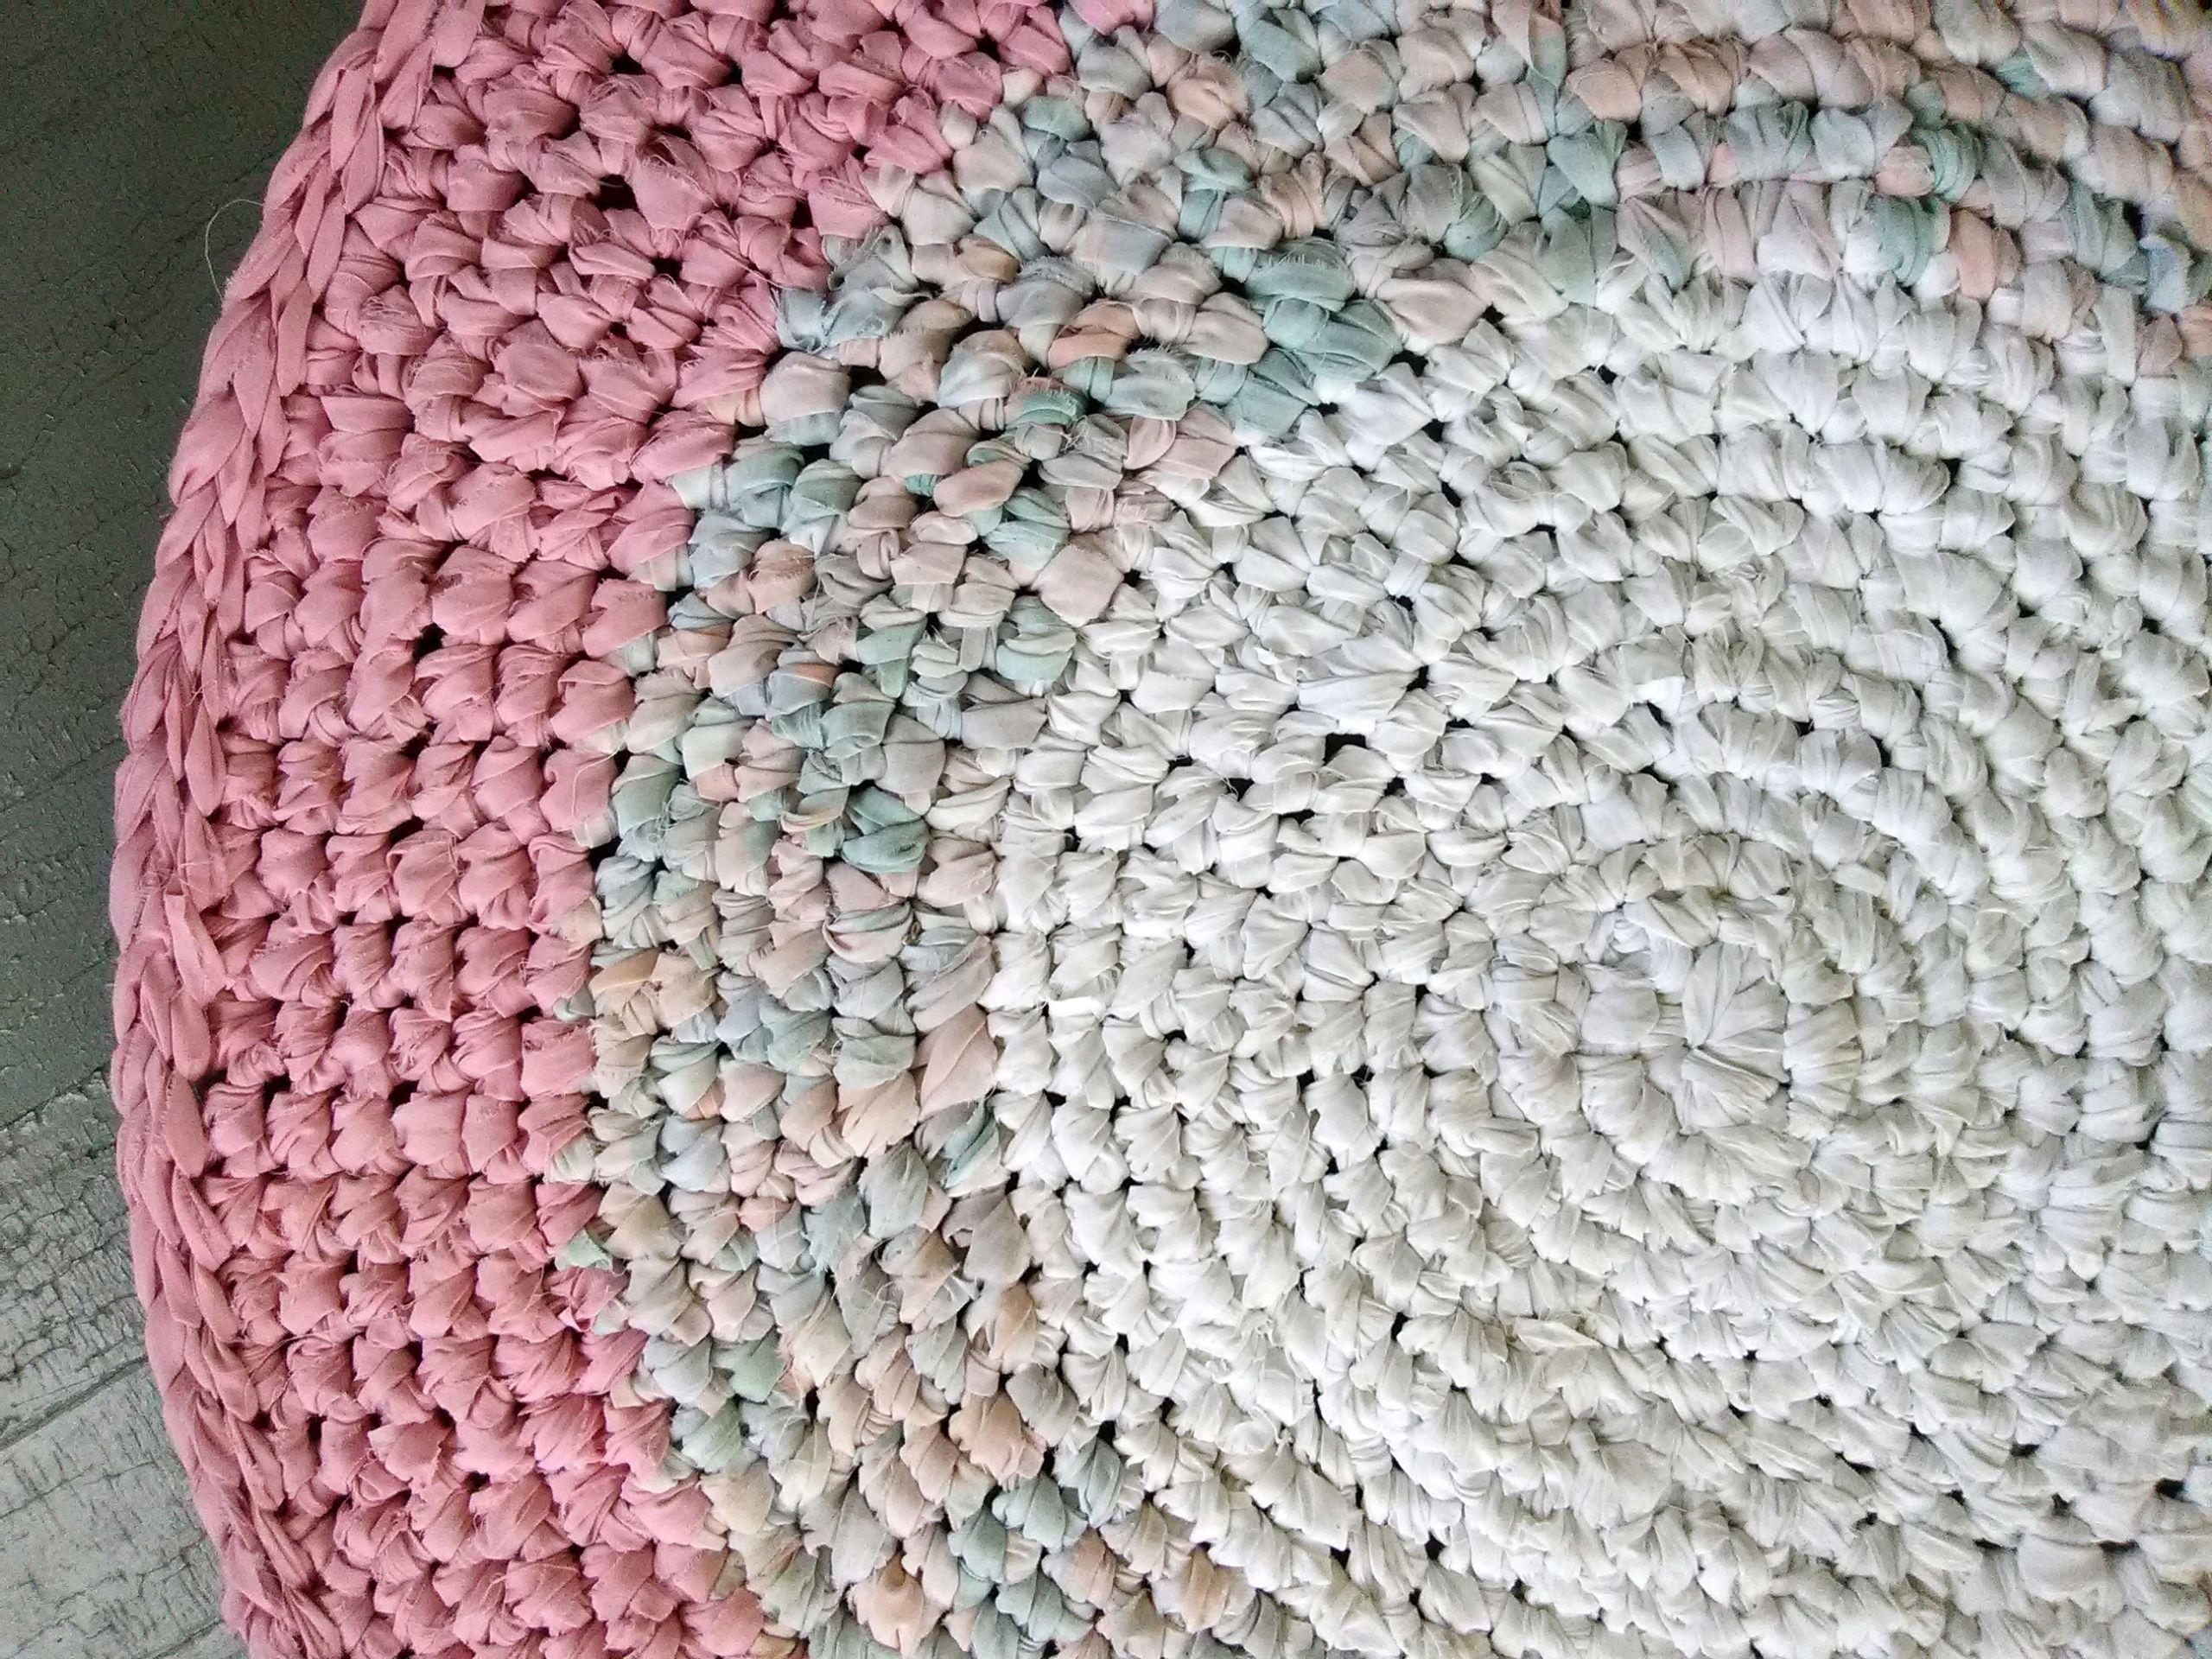 Handmade Crochet Rag Rug 40 Recycled Pink White Pastel Cotton